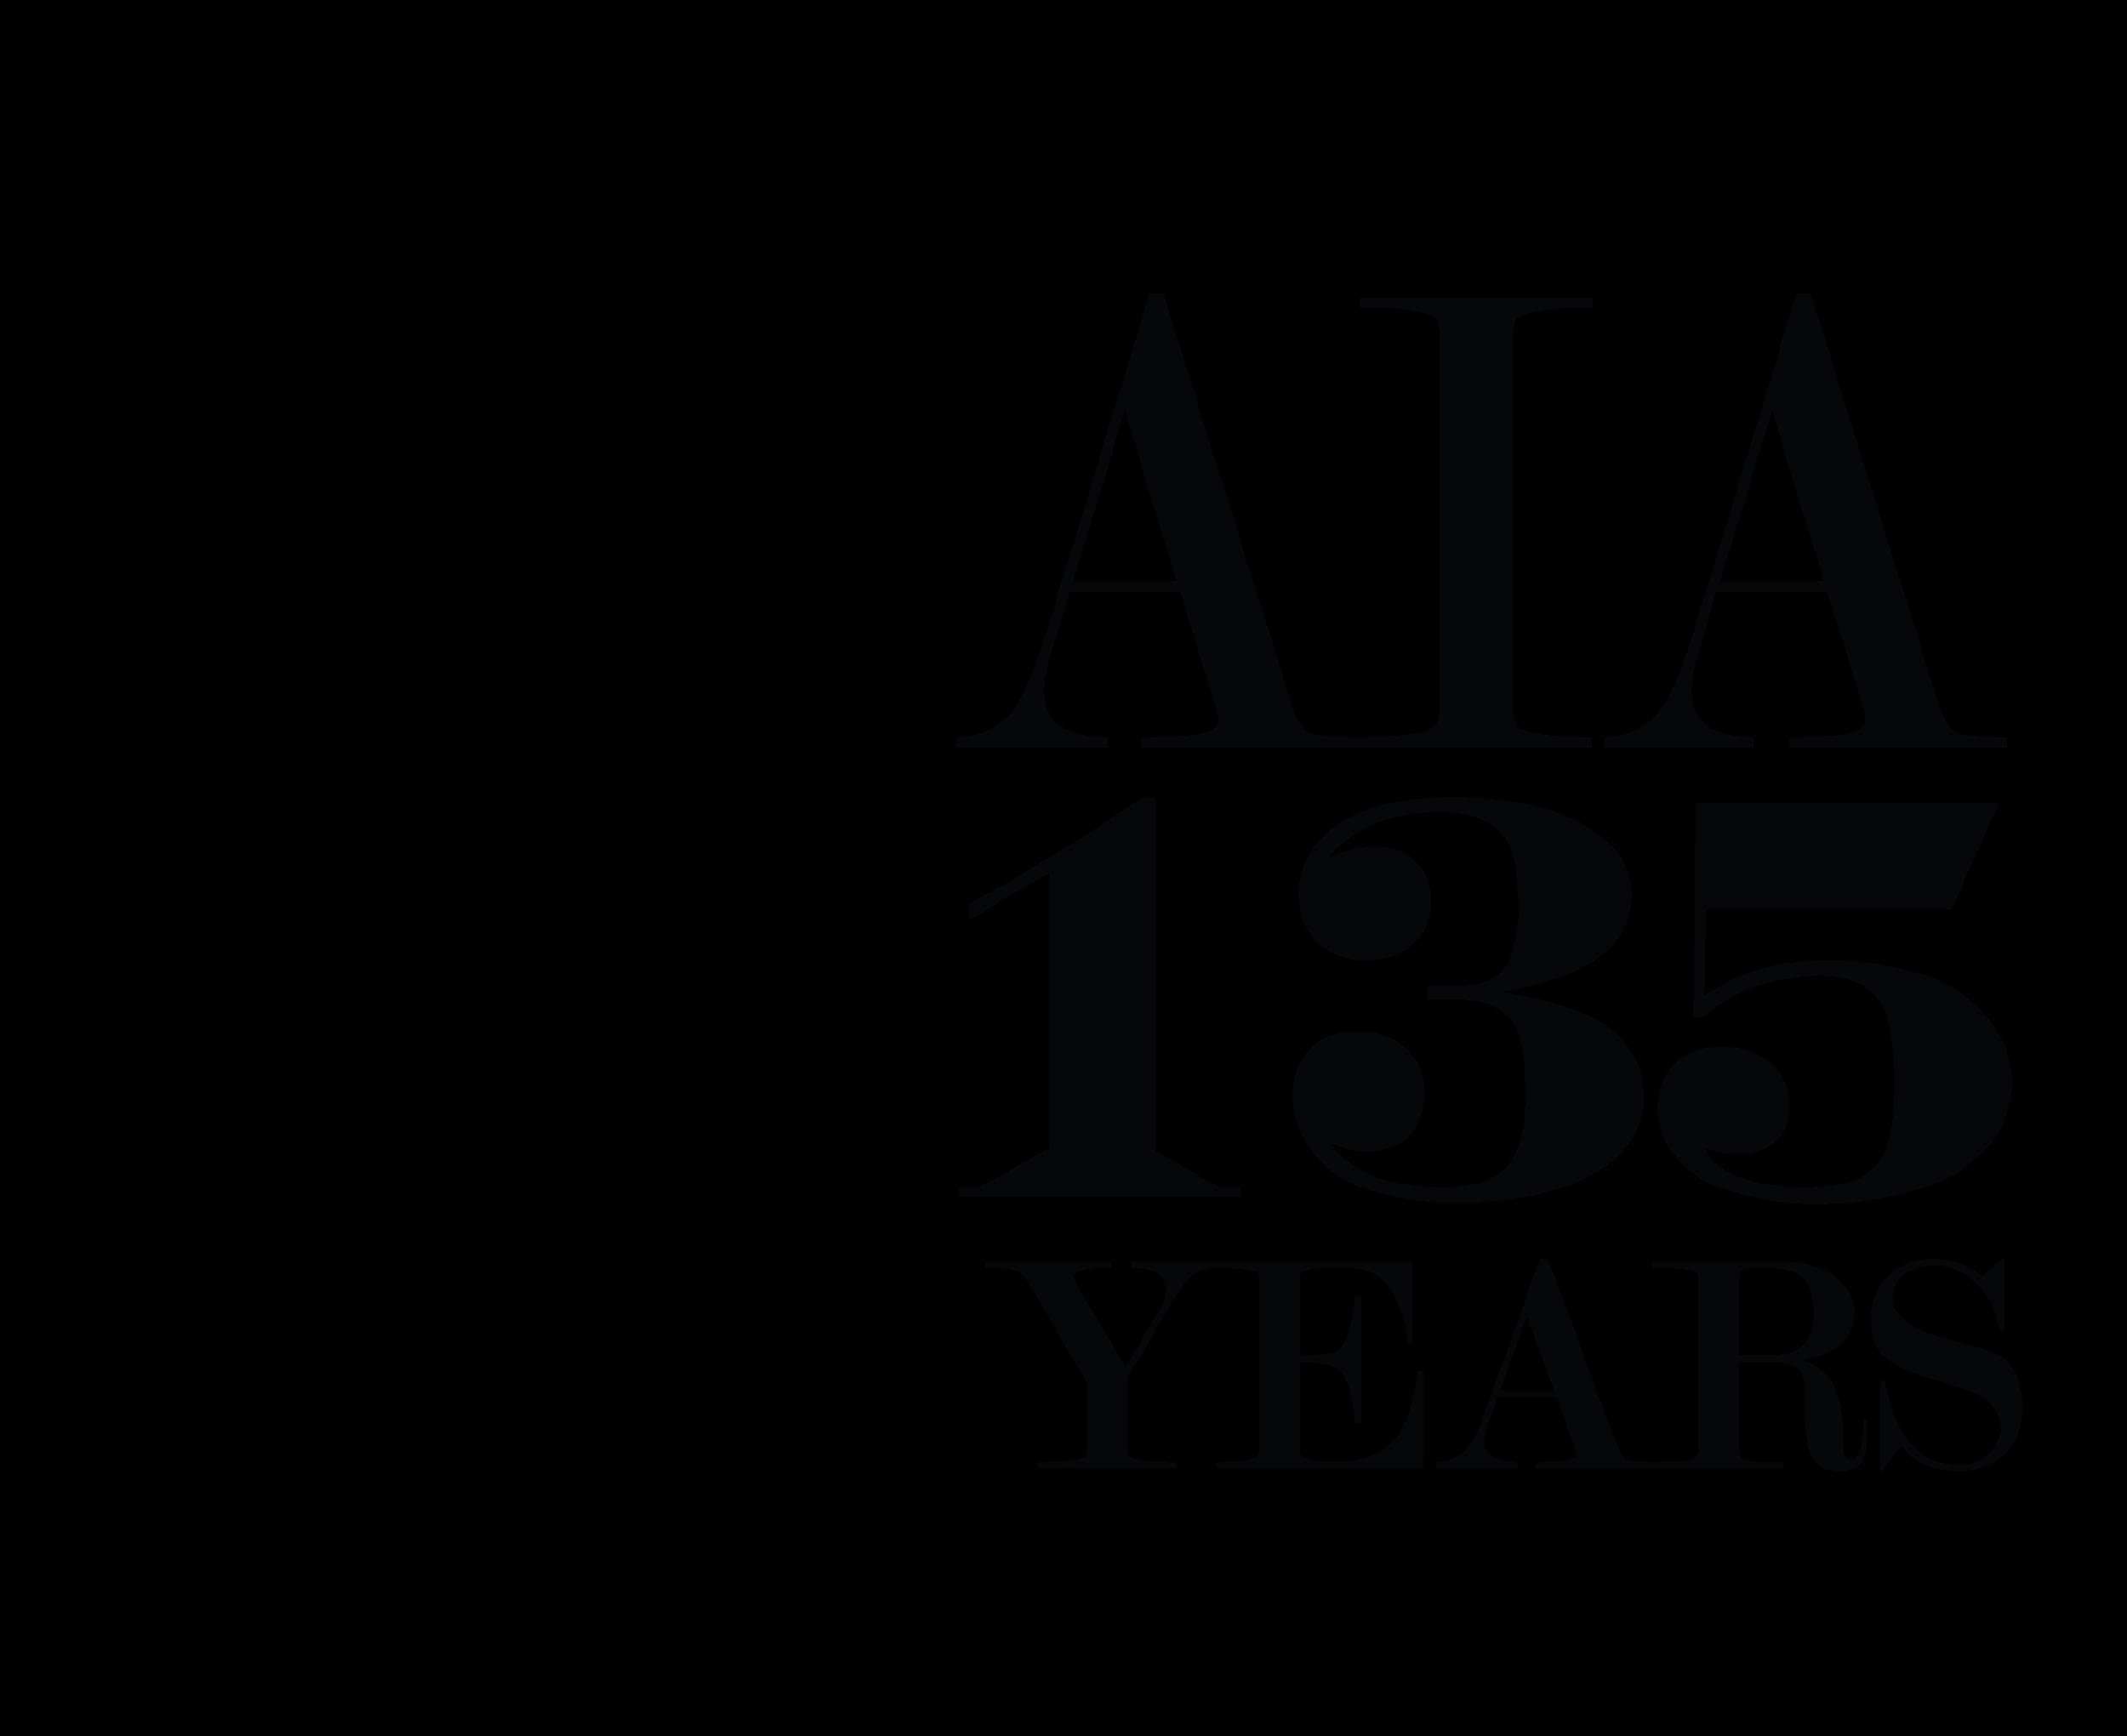 final artboard AIA Owl Logo Black.png